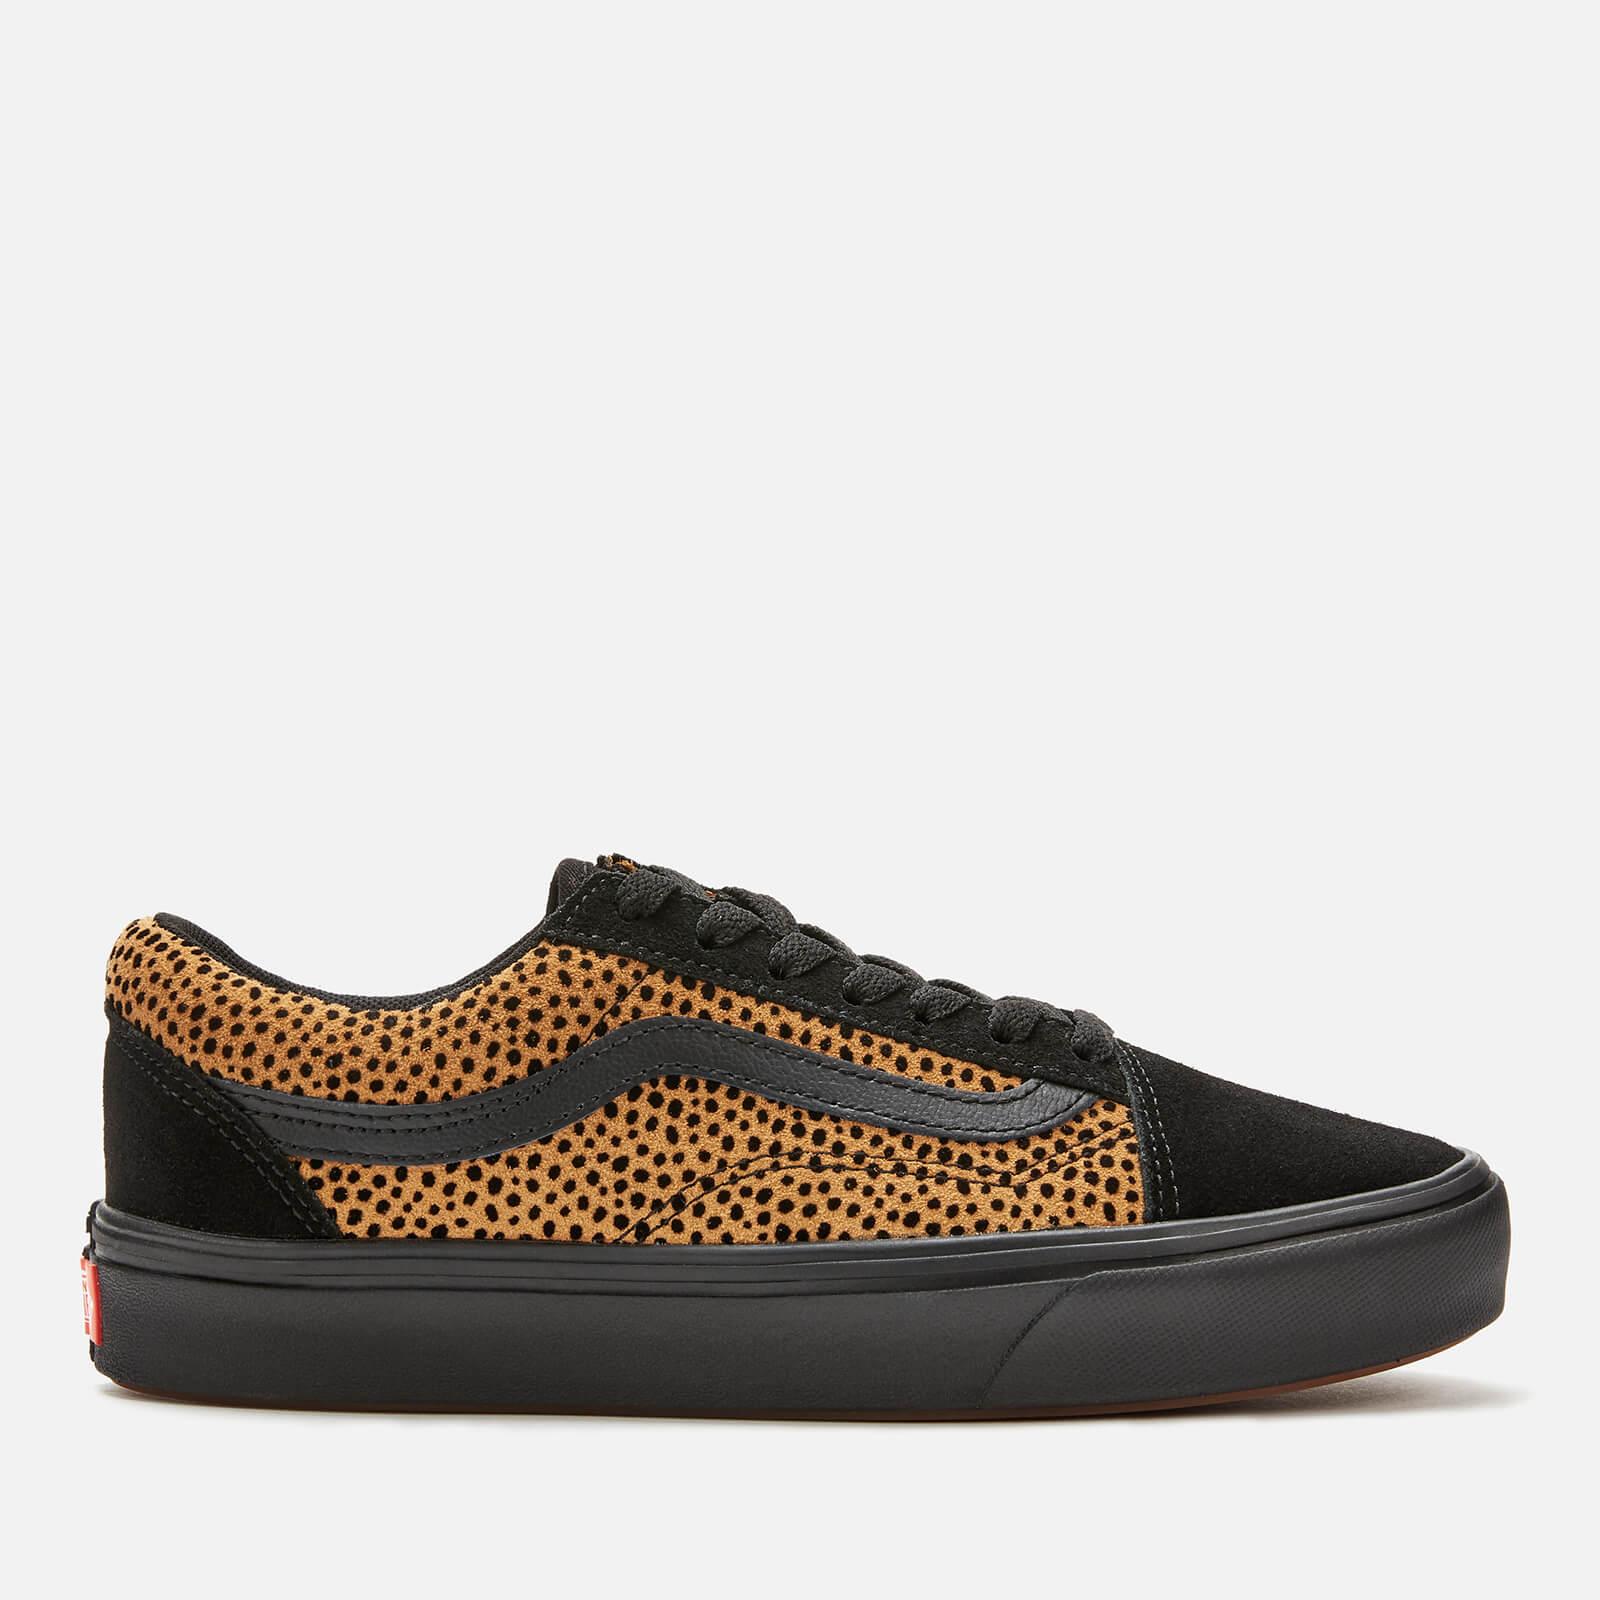 Vans ComfyCush Women's Tiny Cheetah Old Skool Trainers - Black - UK 4 - Black